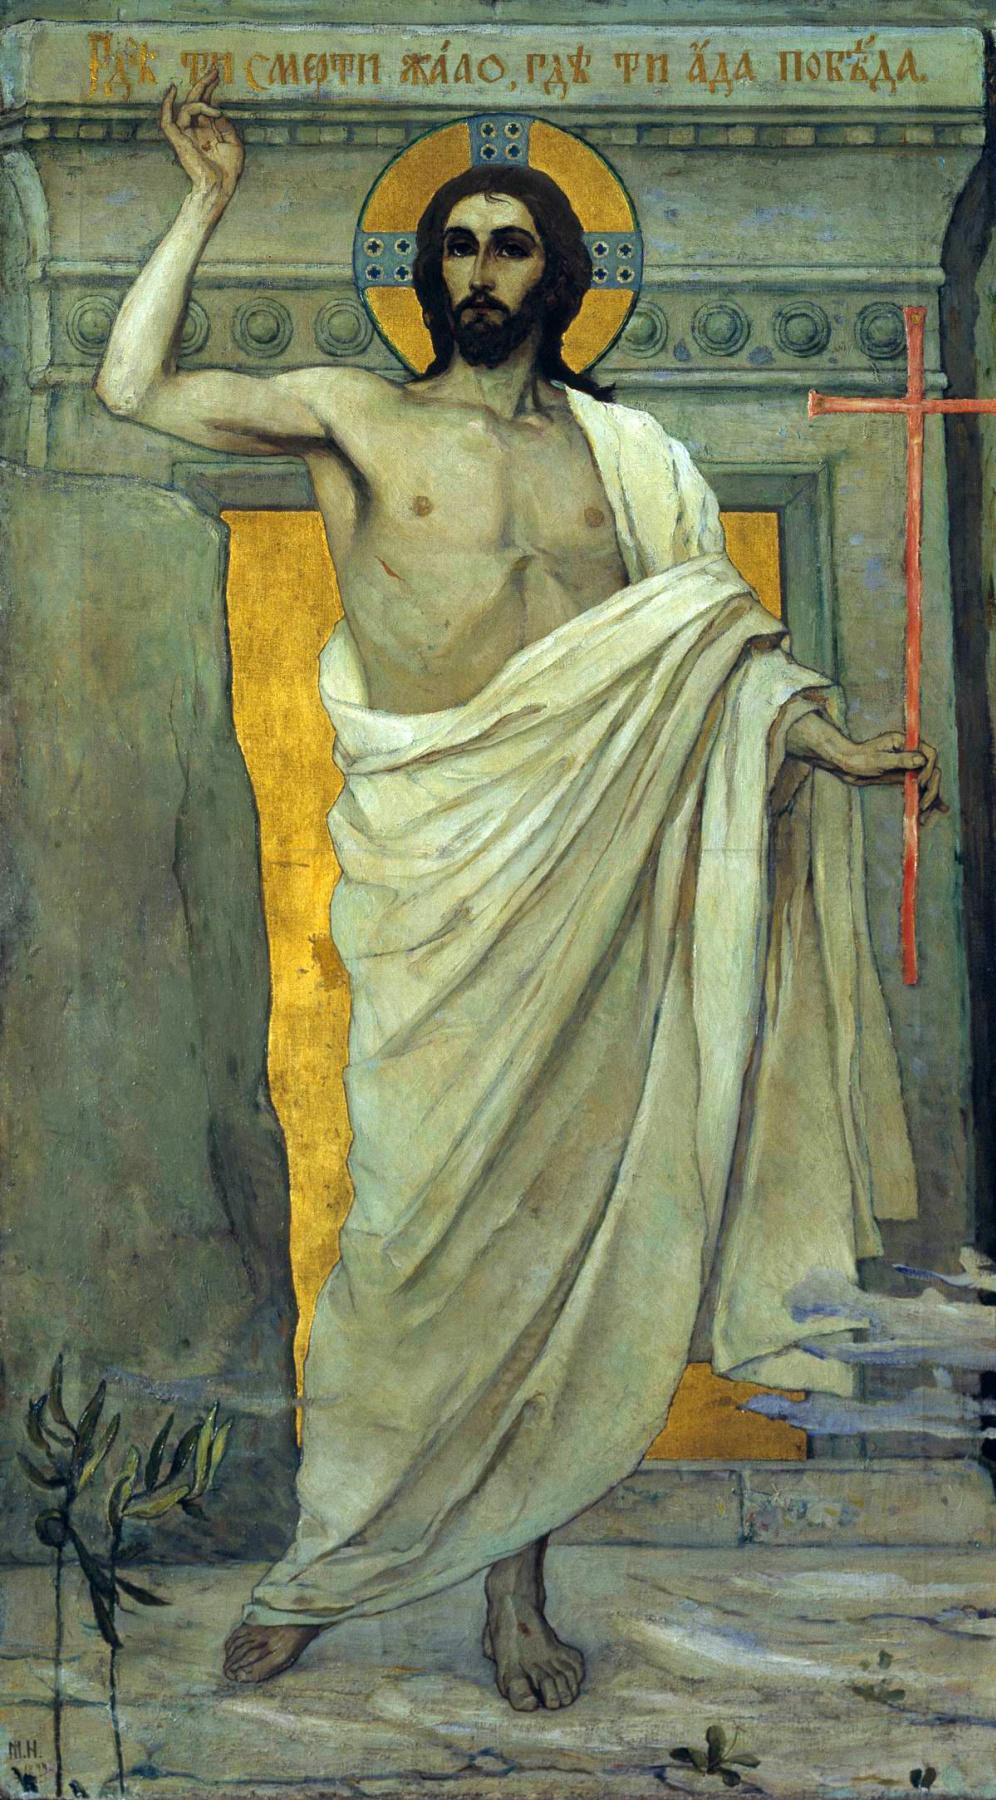 Mikhail Vasilyevich Nesterov. Sunday. The original mosaic to the South of the Shrine of the Church of the Resurrection